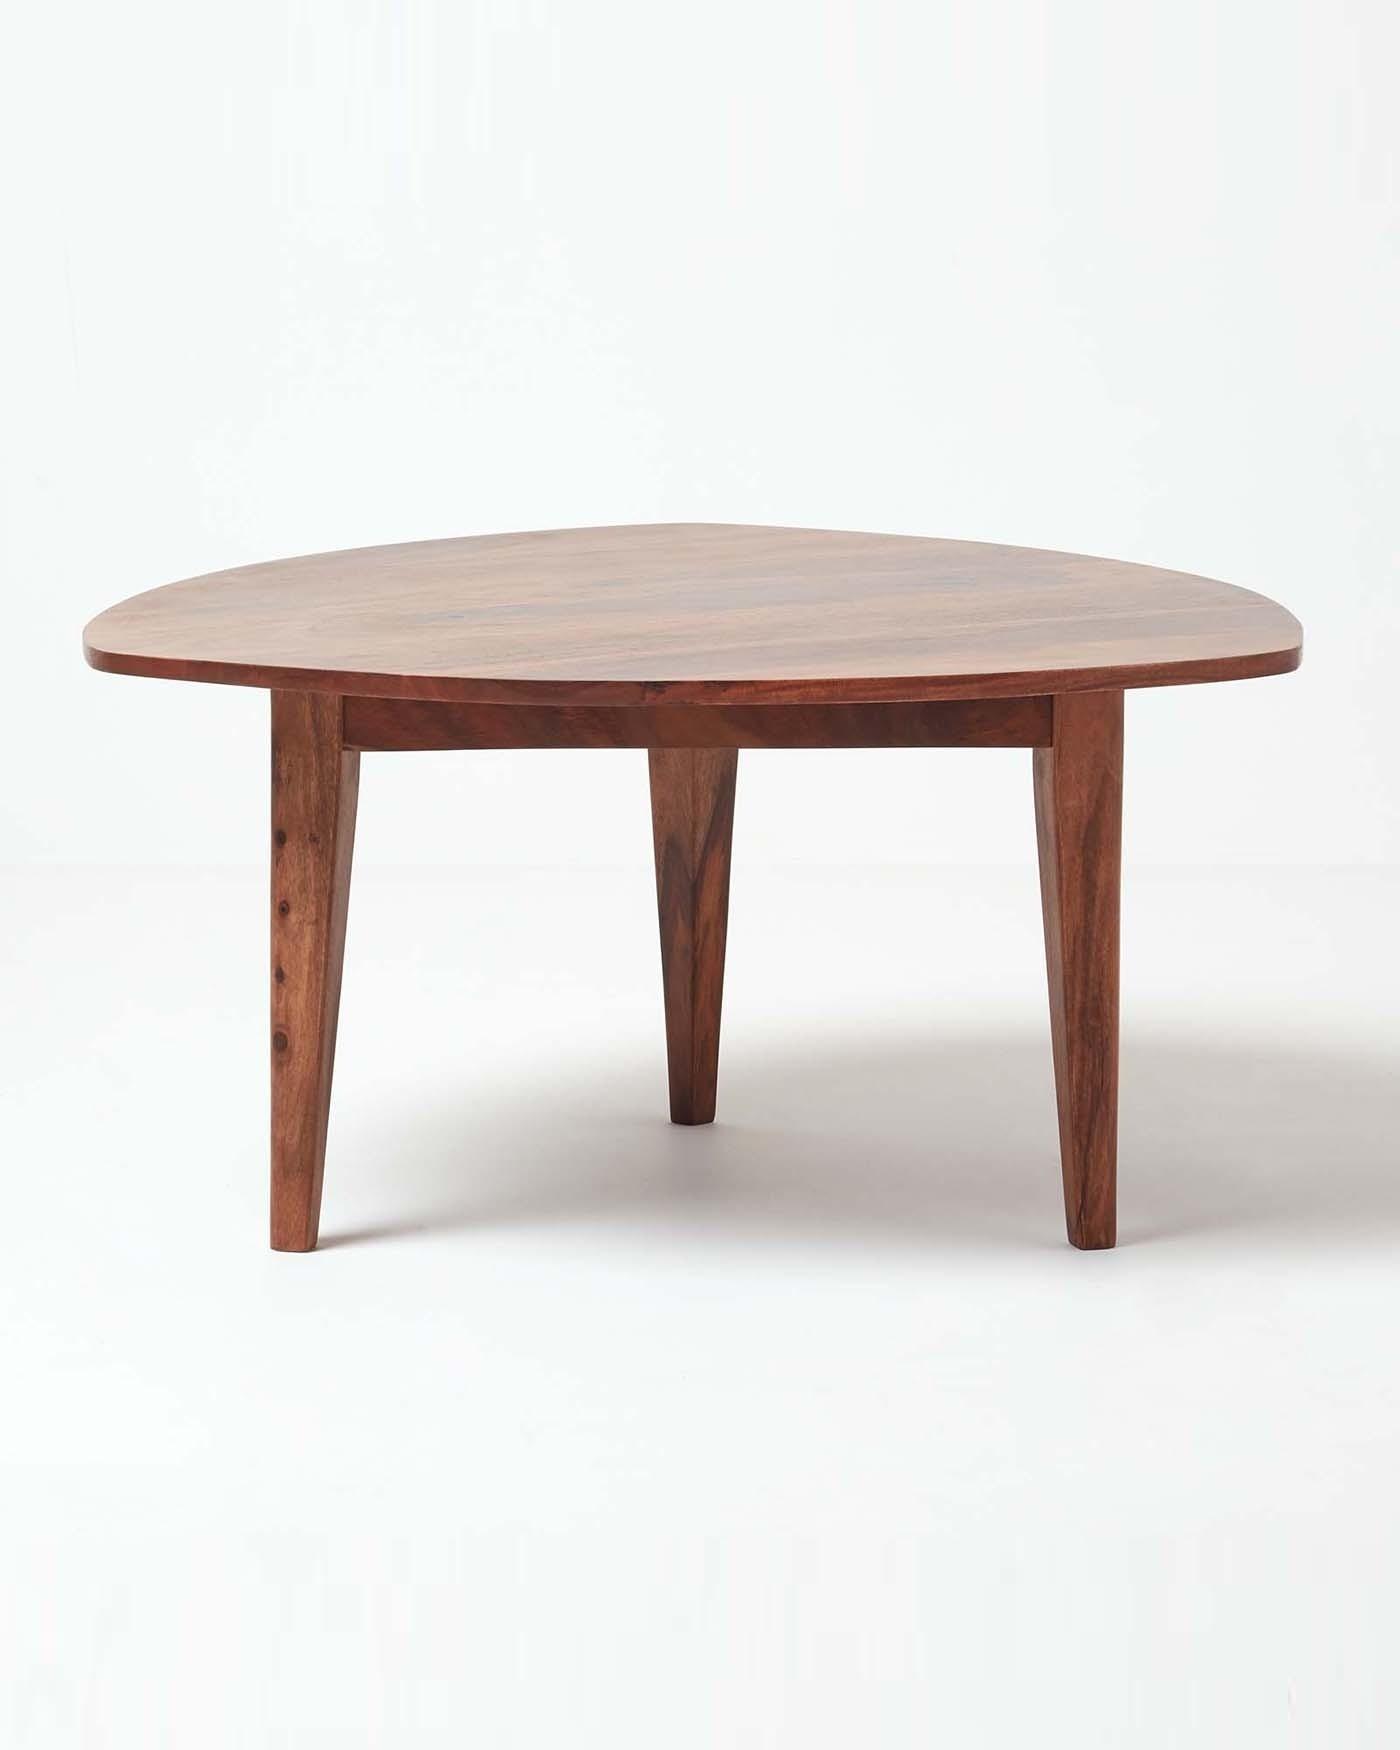 Dark Wood Triangular Coffee Table Retro Design 100 Solid Wood pertaining to size 1400 X 1750